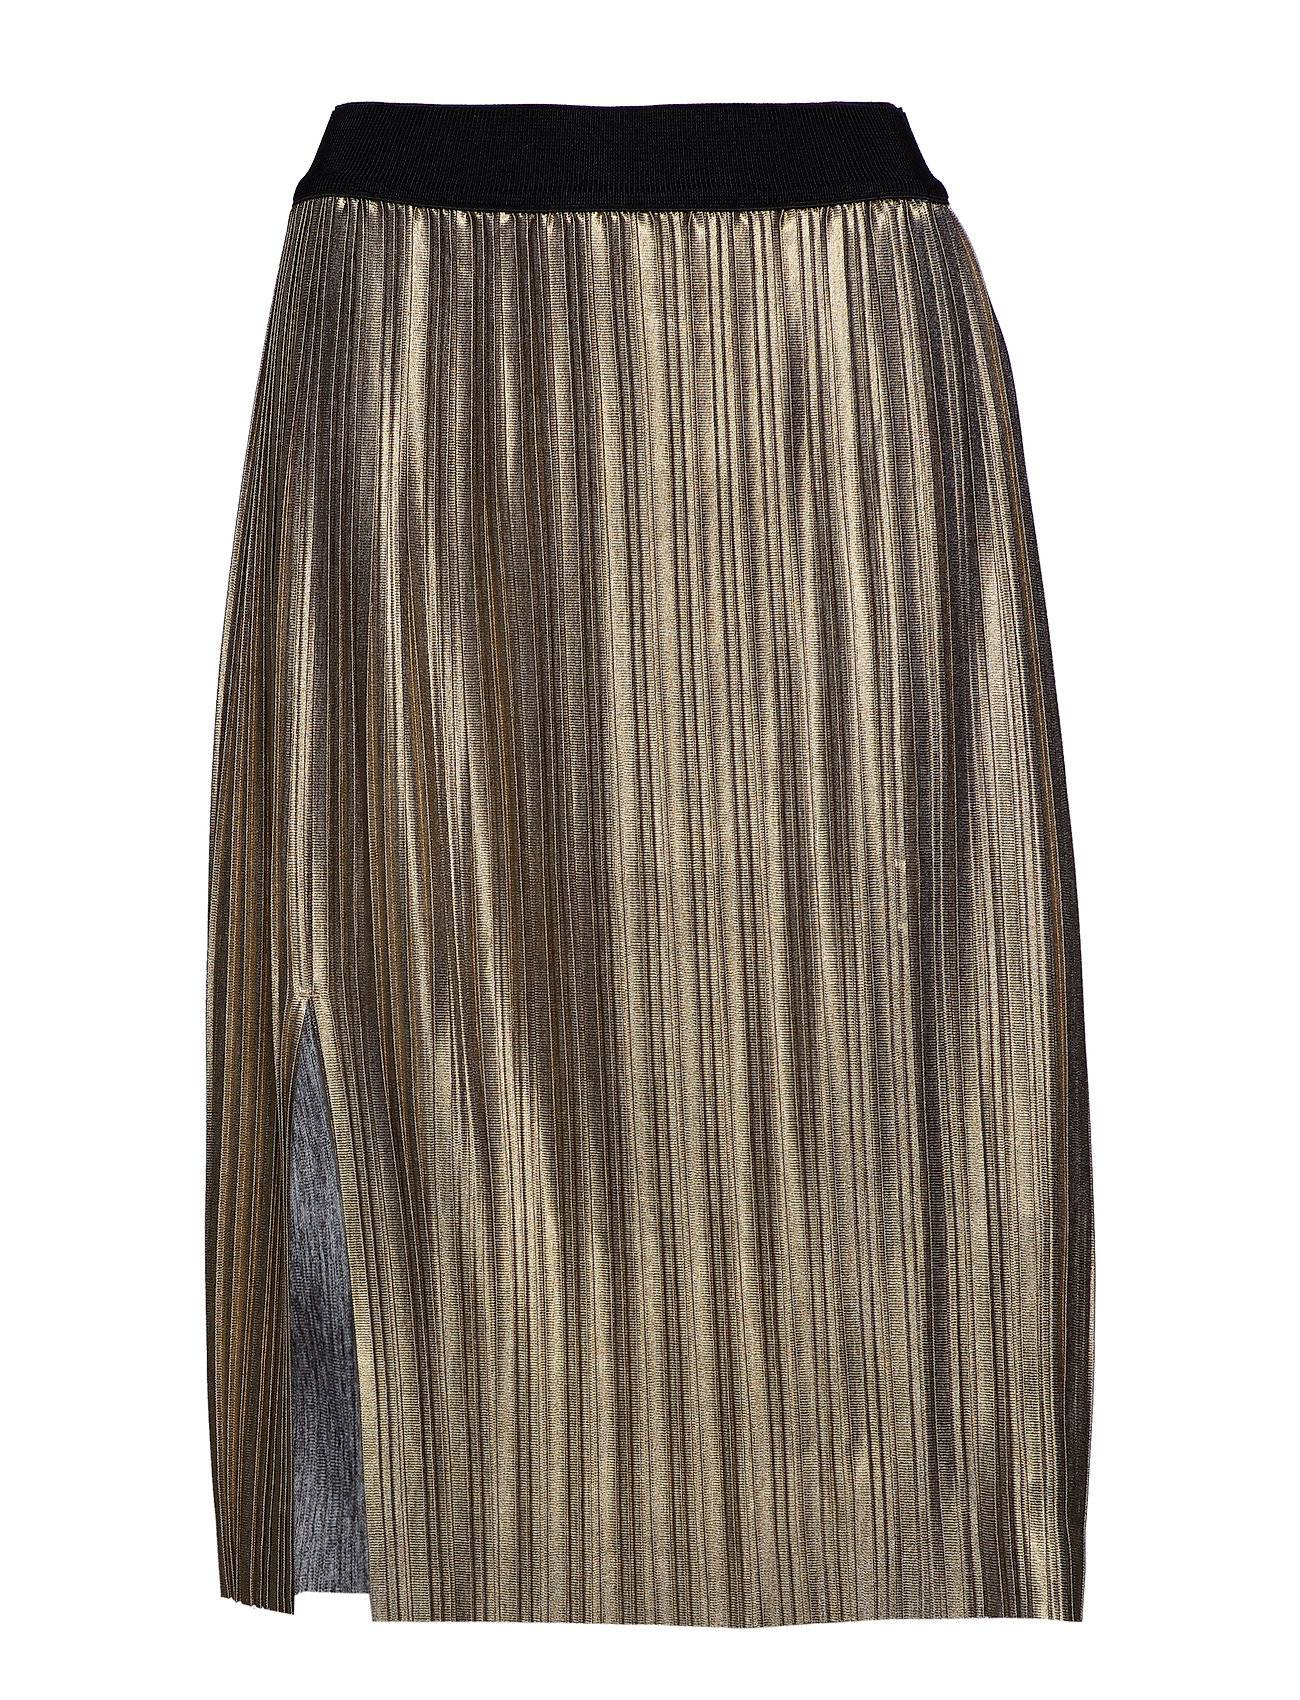 Bruuns Bazaar Nilla Chilla Midi Skirt